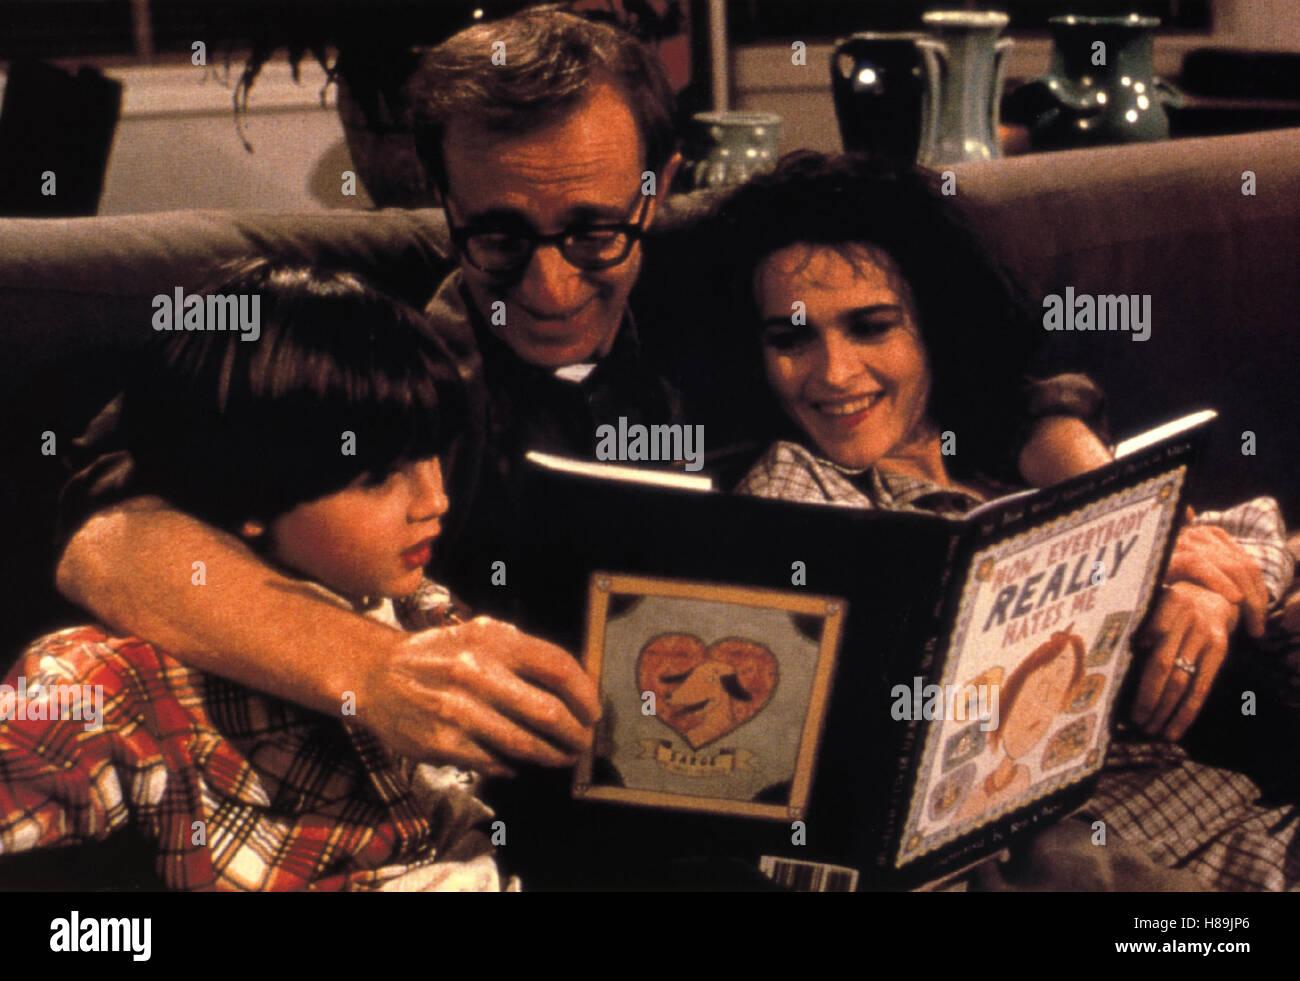 Geliebte Aphrodite, (MIGHTY APHRODITE) USA 1996, Regie: Woody Allen, WOODY ALLEN (mi), HELENA BONHAM CARTER (re), - Stock Image